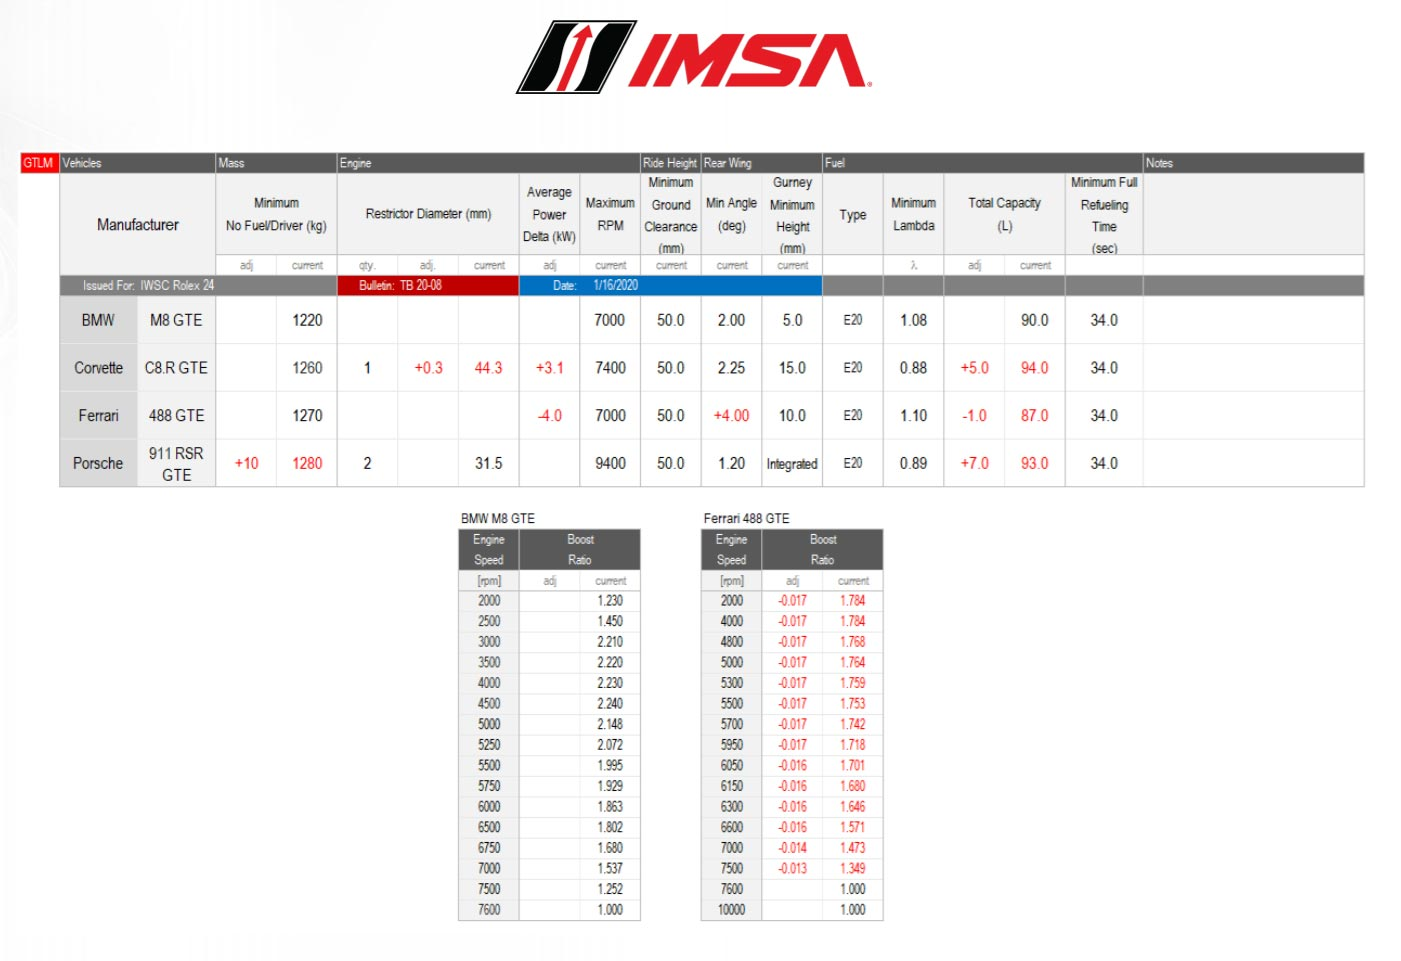 IMSA Makes Positive BoP Adjustments to the Corvette C8.Rs Ahead of the Rolex 24